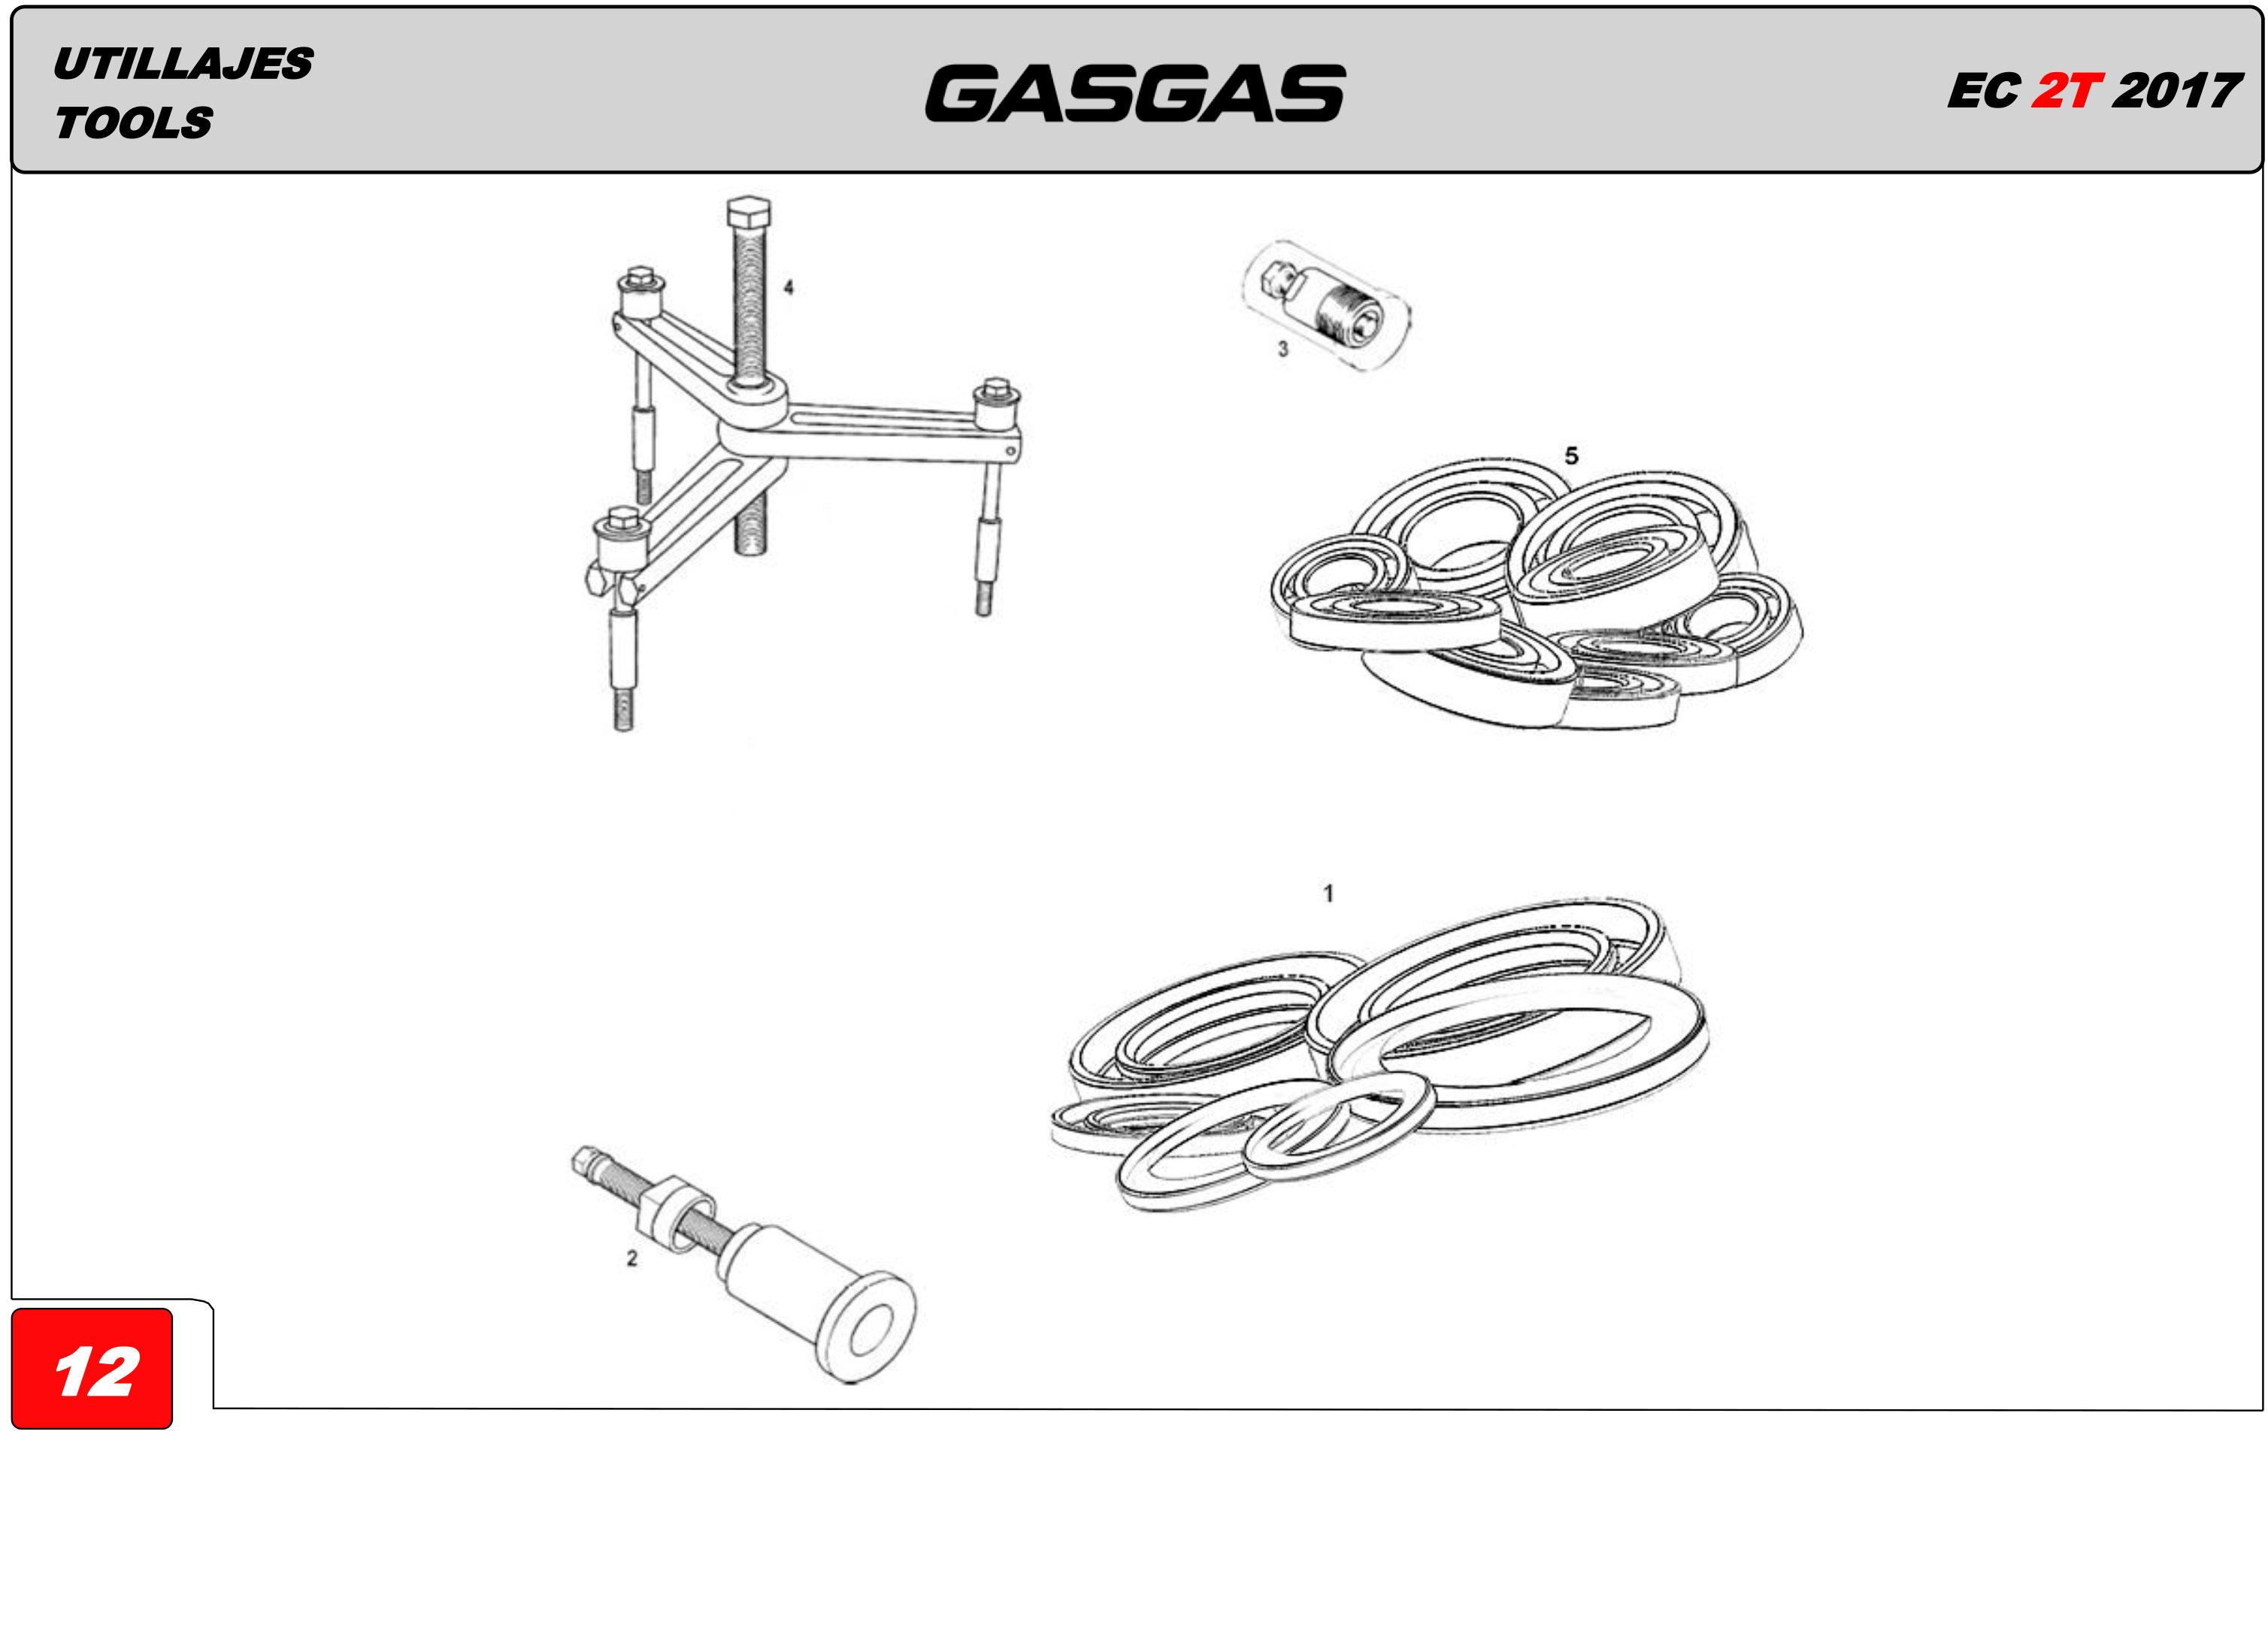 TOOLS GAS GAS EC250R 2017